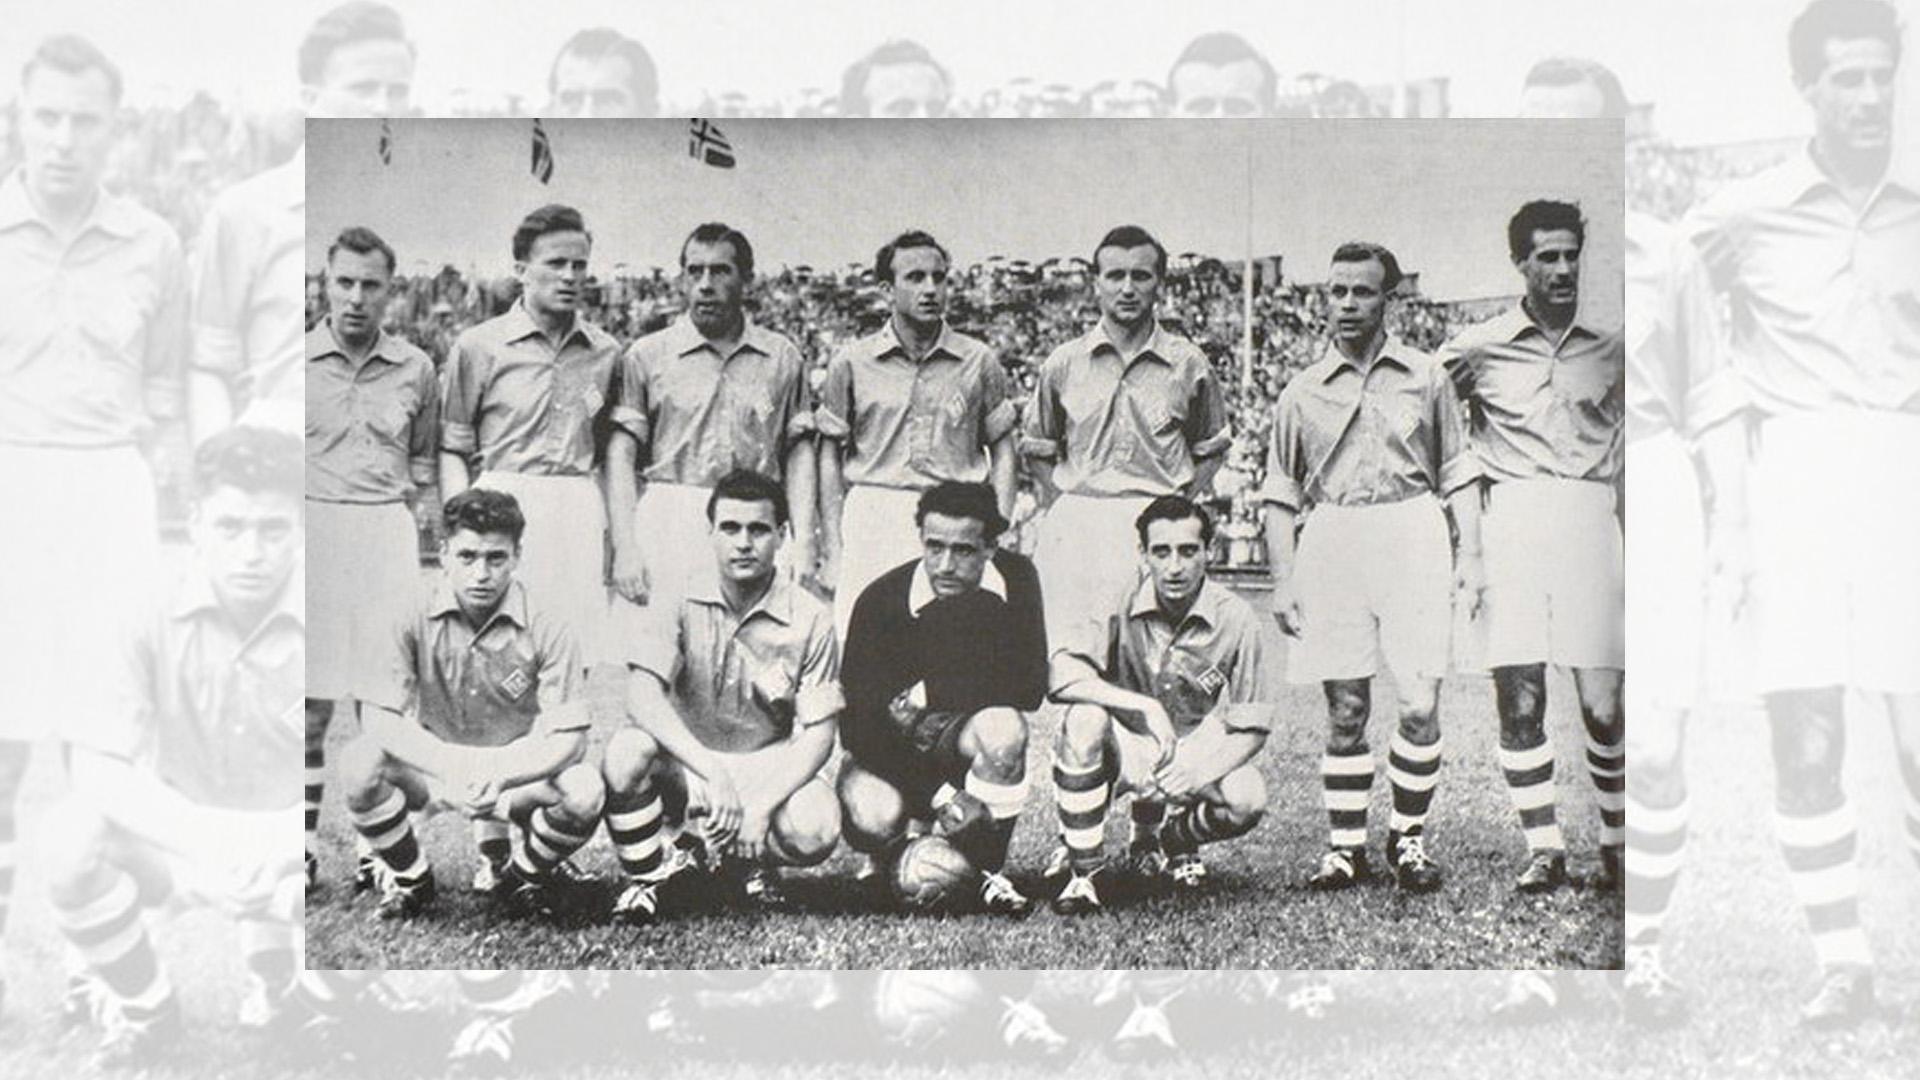 Seleccion Sarre Saarland National Team 1953